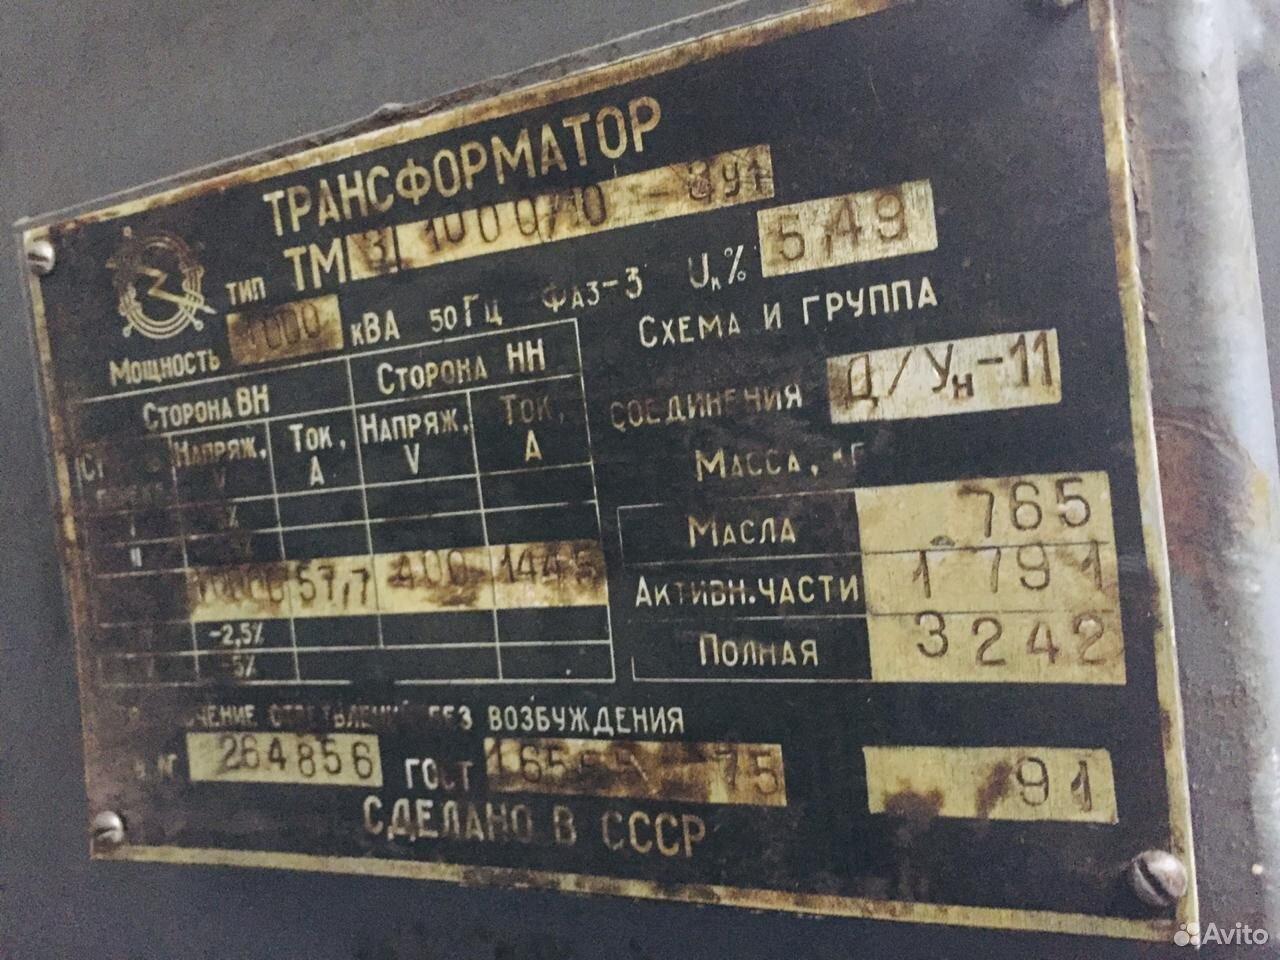 Трансформатор тмз-1000/10/0,4 4шт